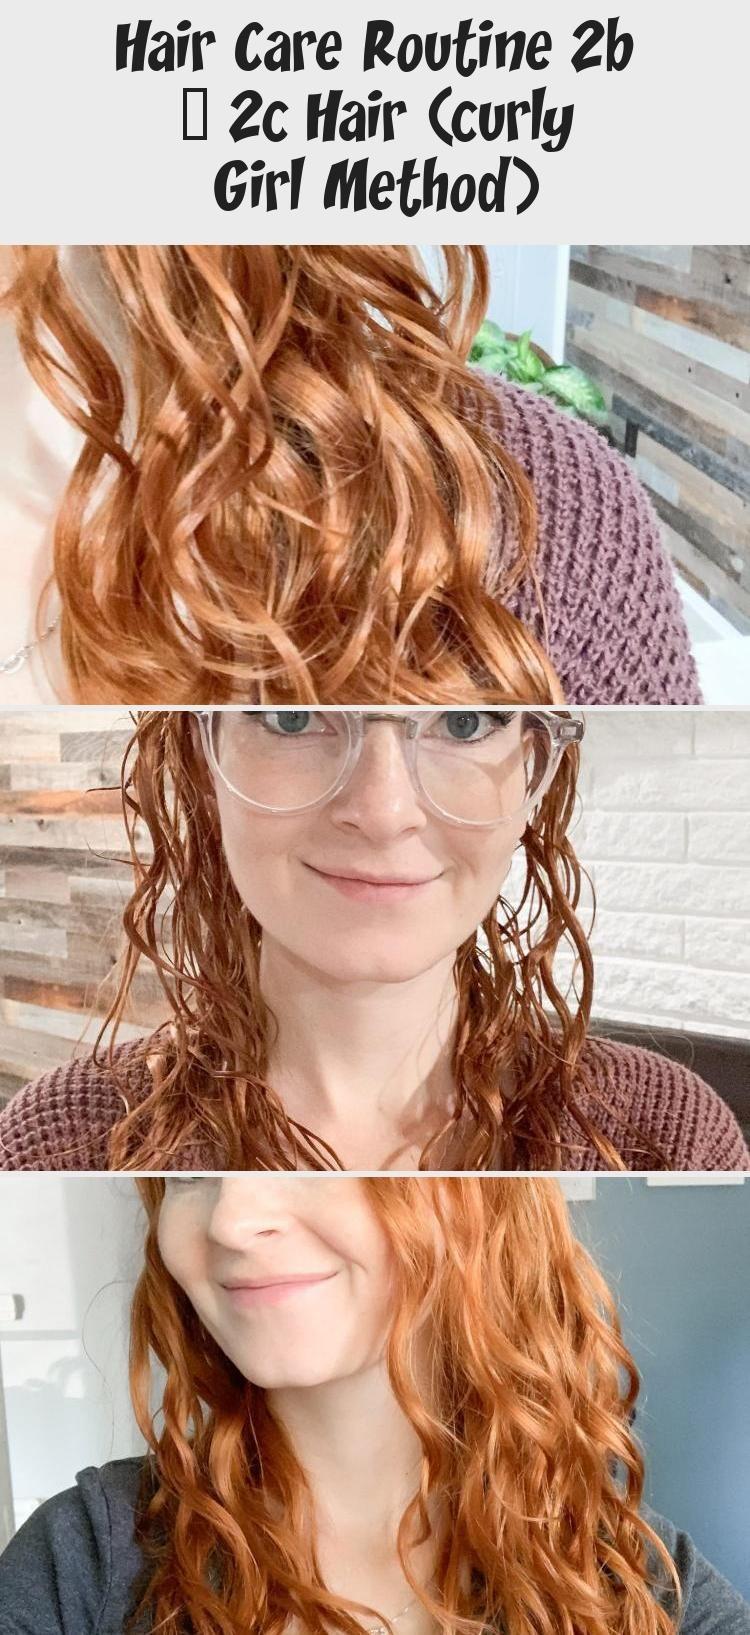 Hair Care Routine 2b 2c Hair (curly Girl Method Wavy